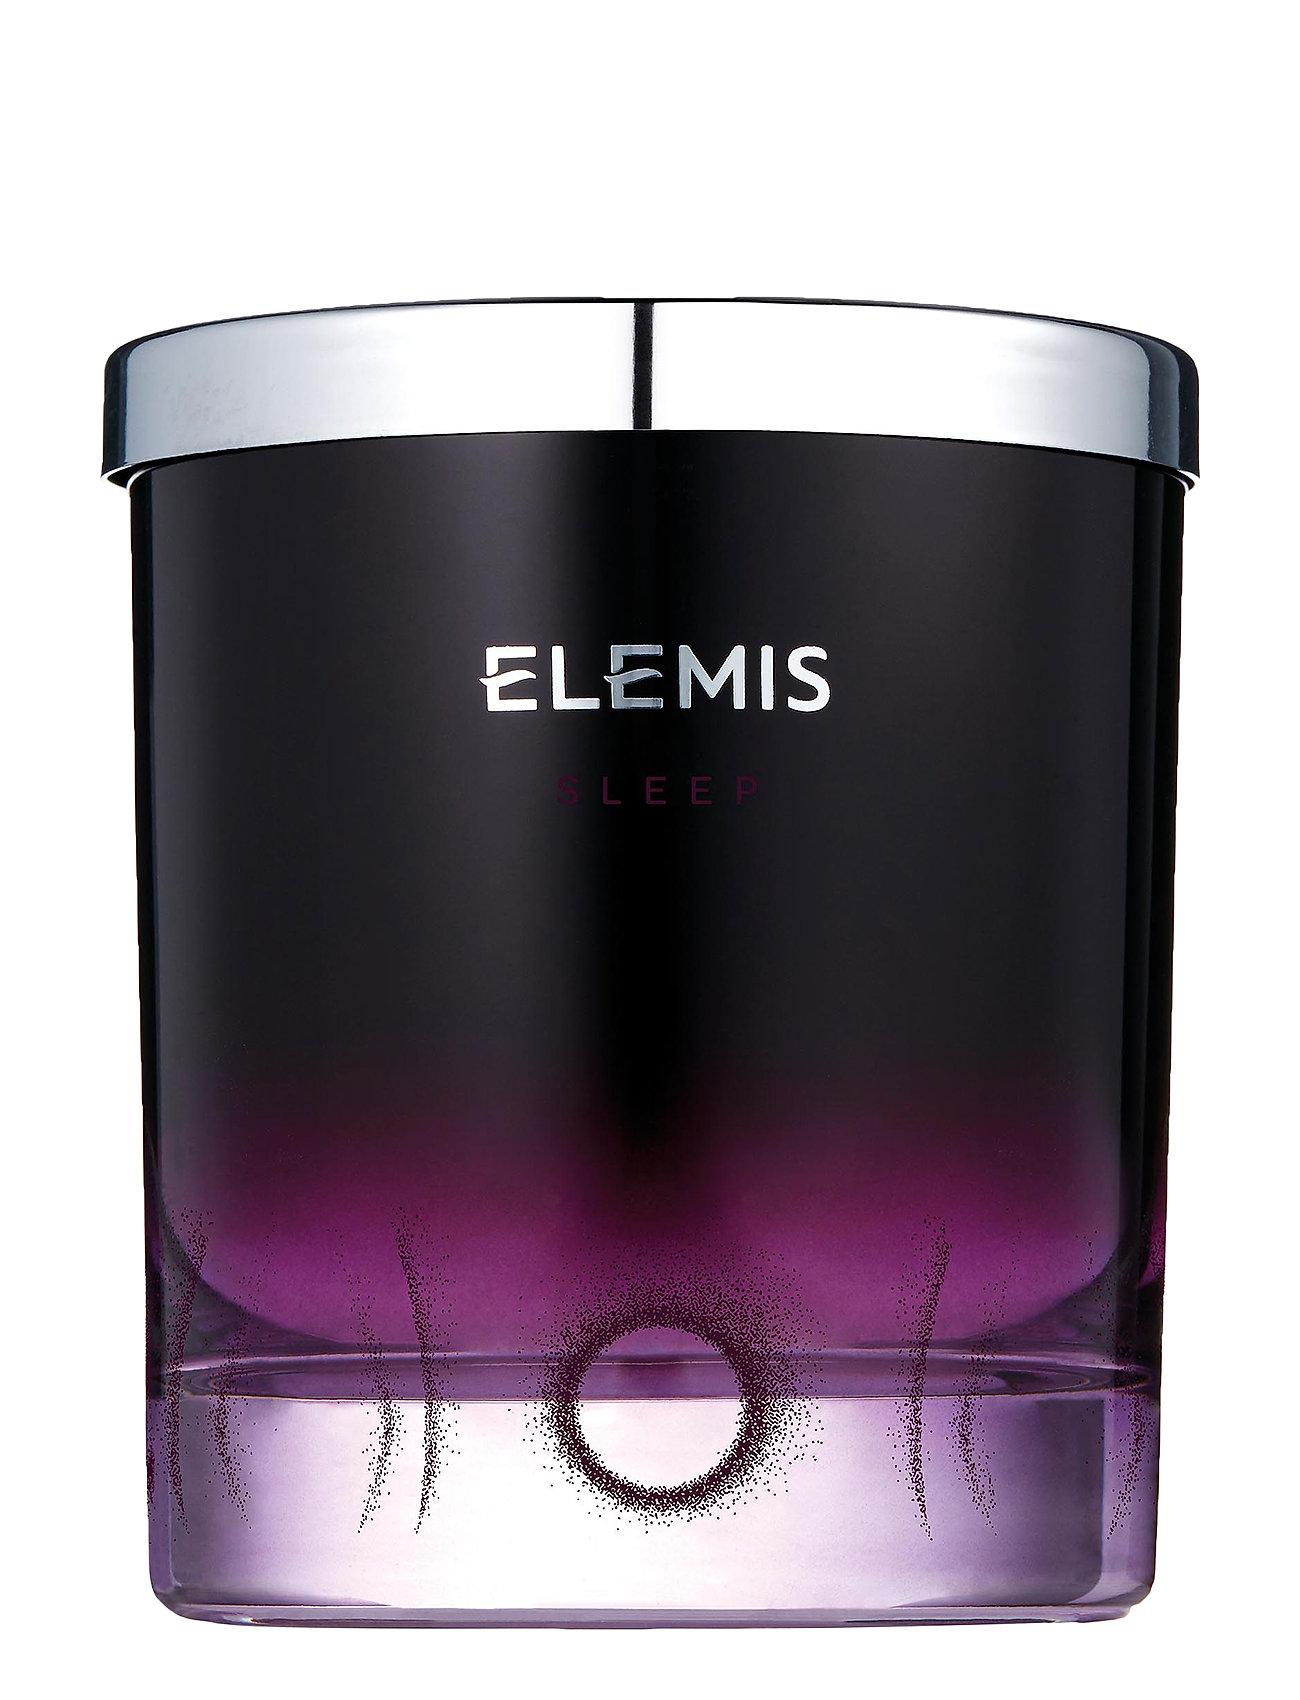 Elemis Sleep Candle - CLEAR